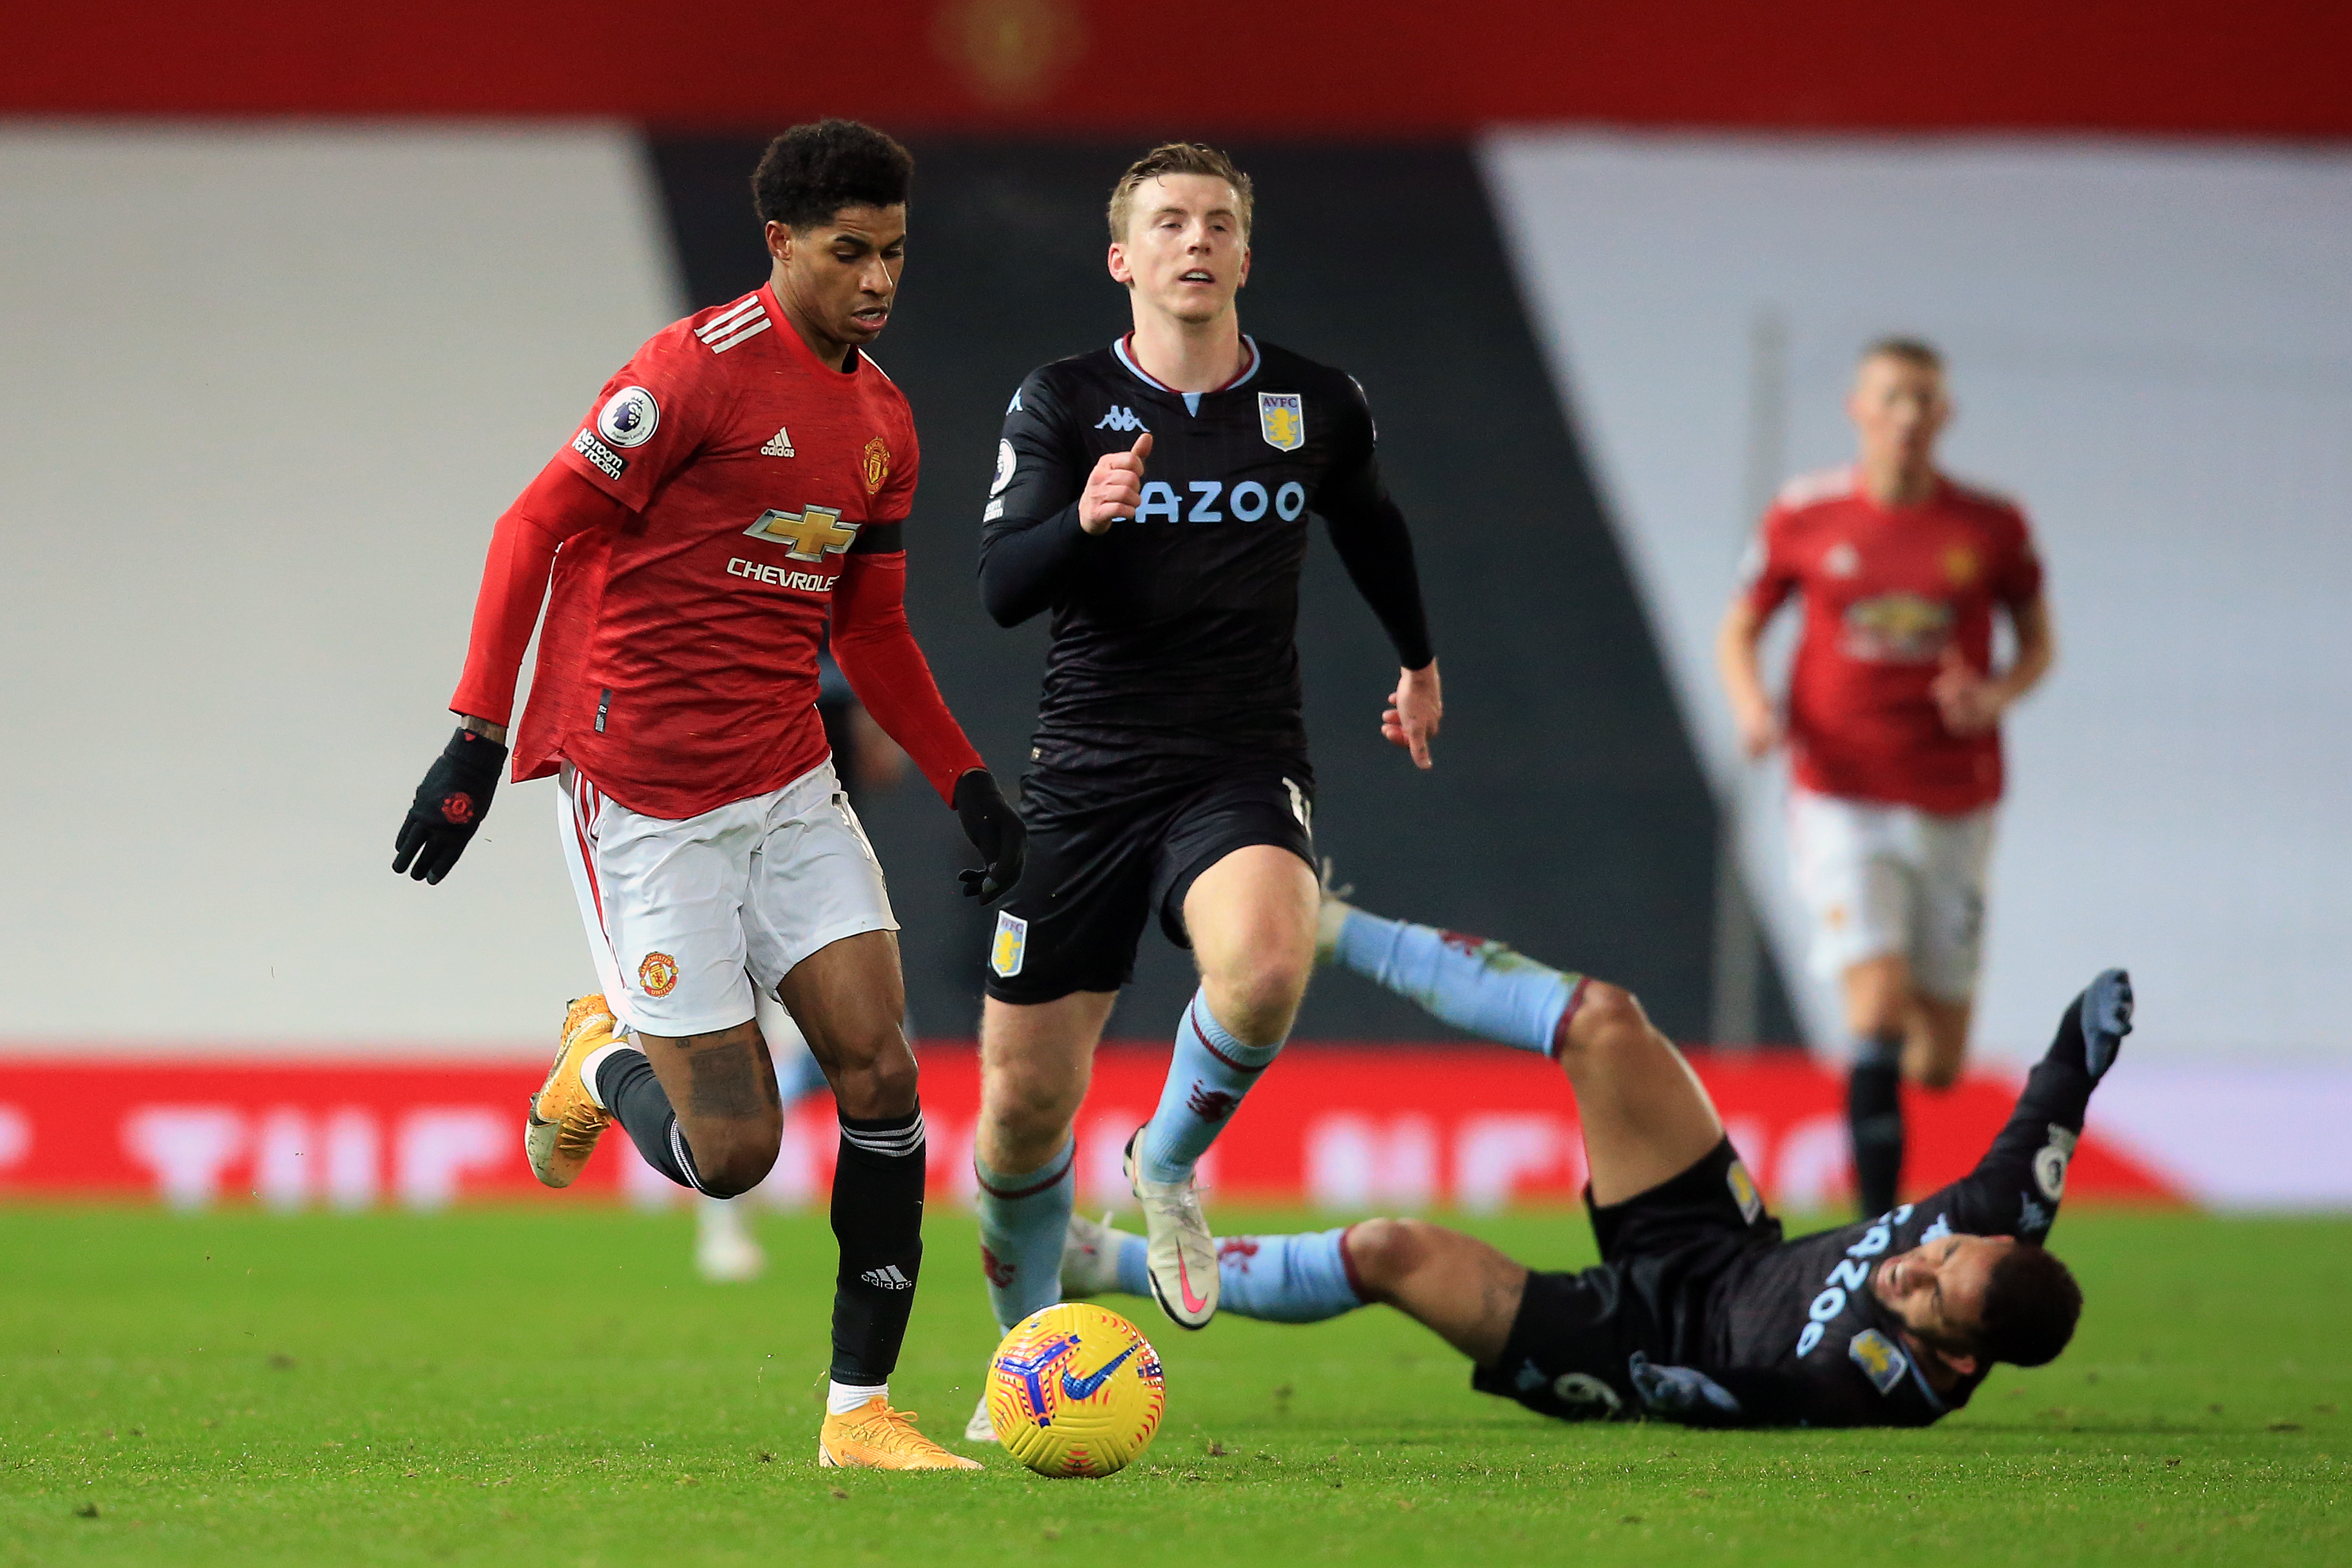 Manchester United v Aston Villa - Premier League